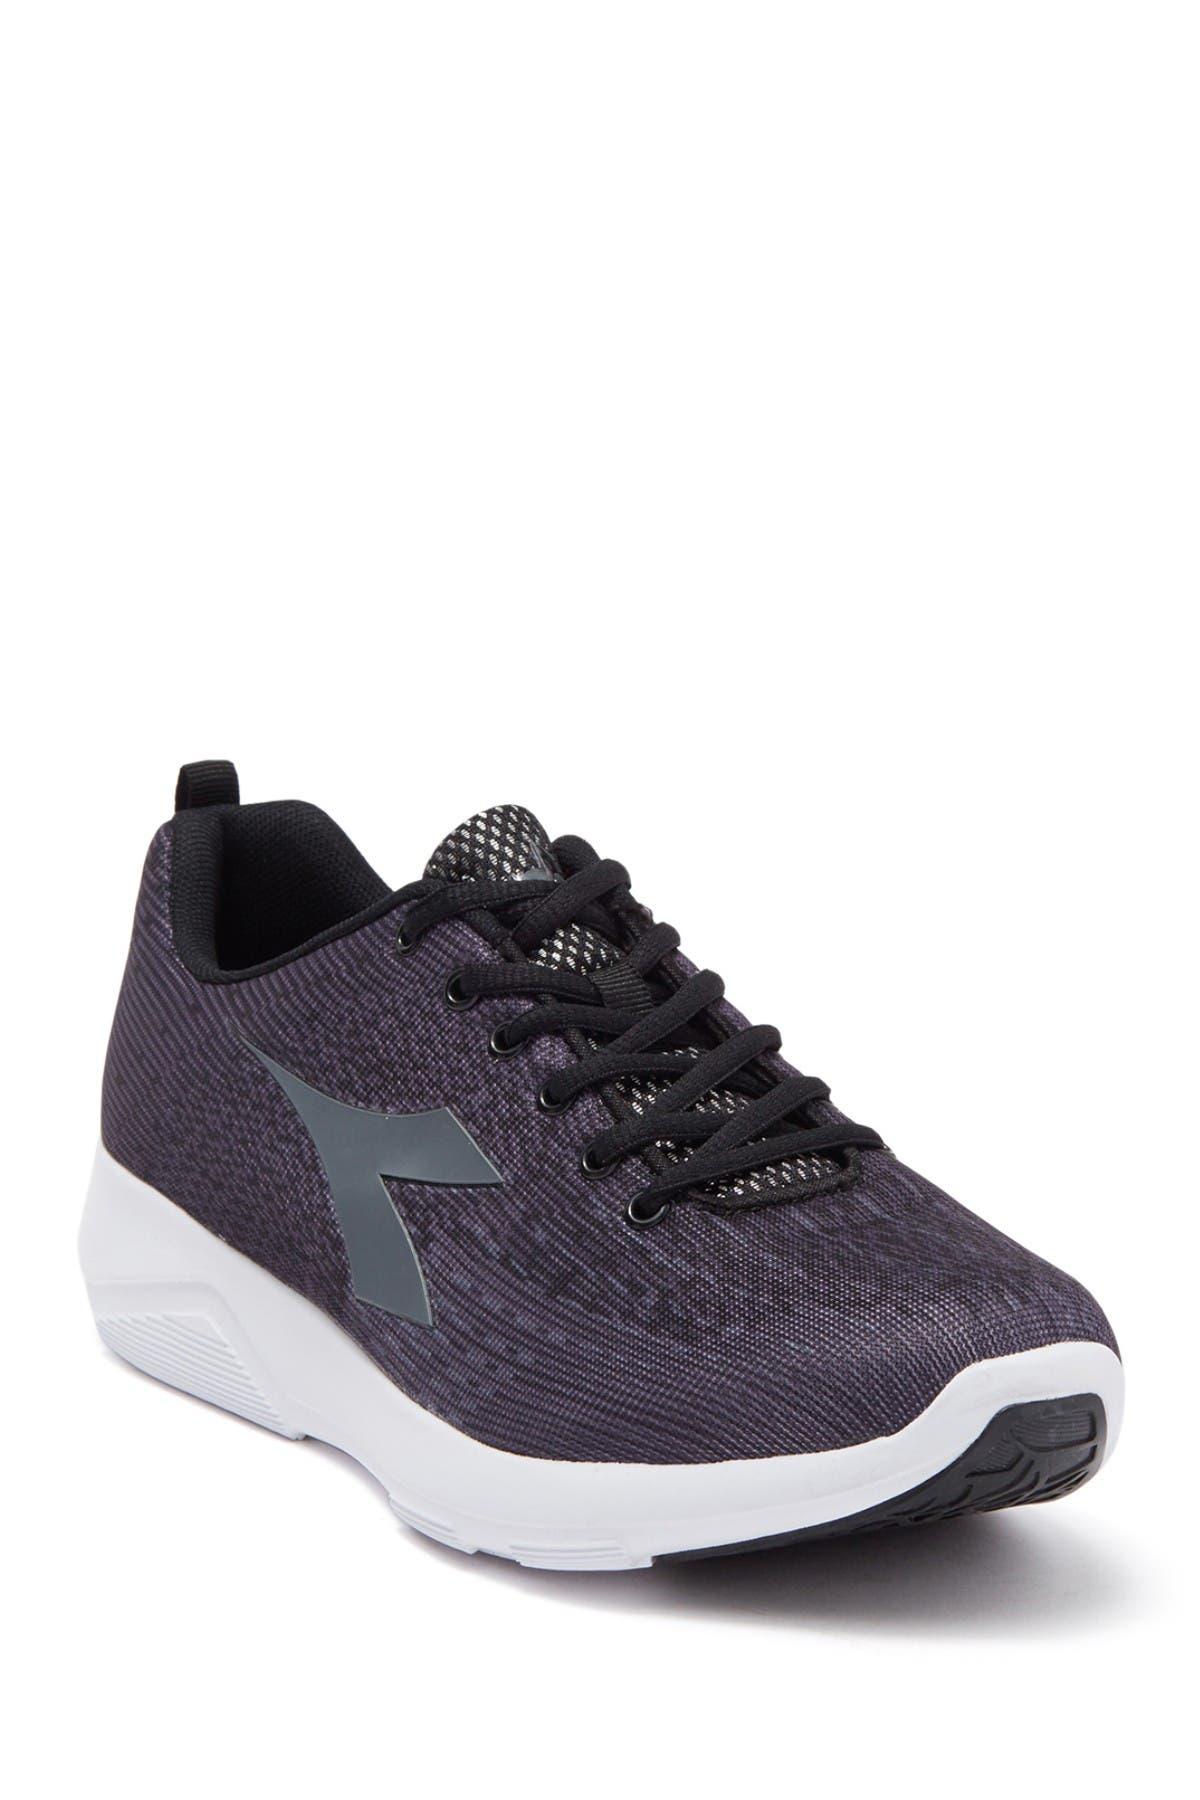 Image of Diadora X-Run 2 Light Sneaker